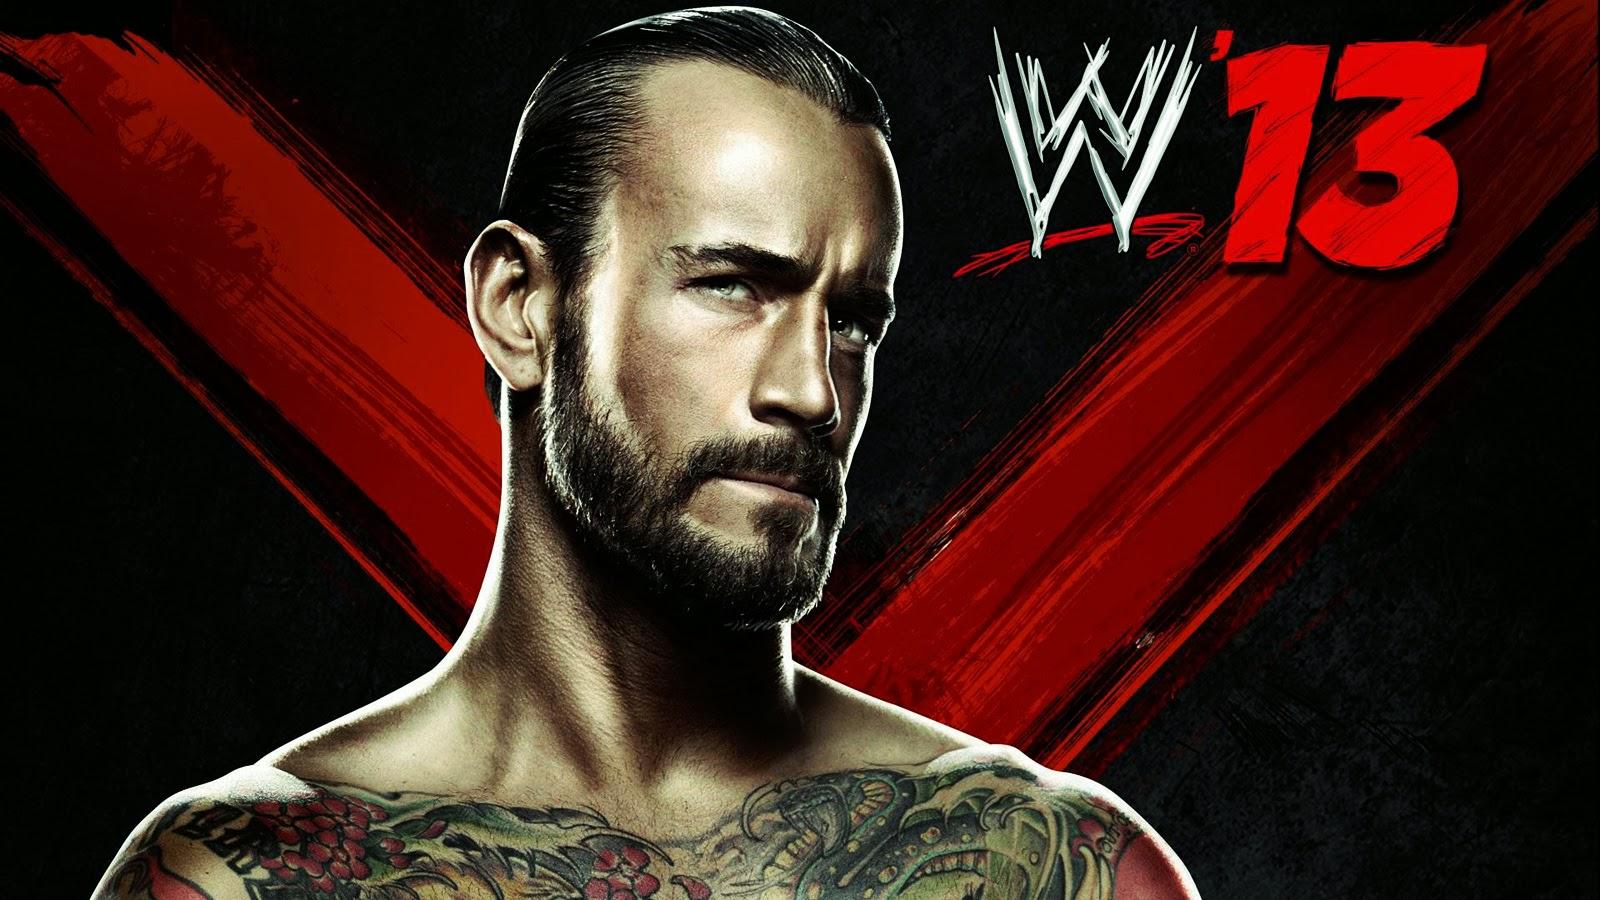 DREAM ZONE WWE Wrestlers Wallpapers 1600x900